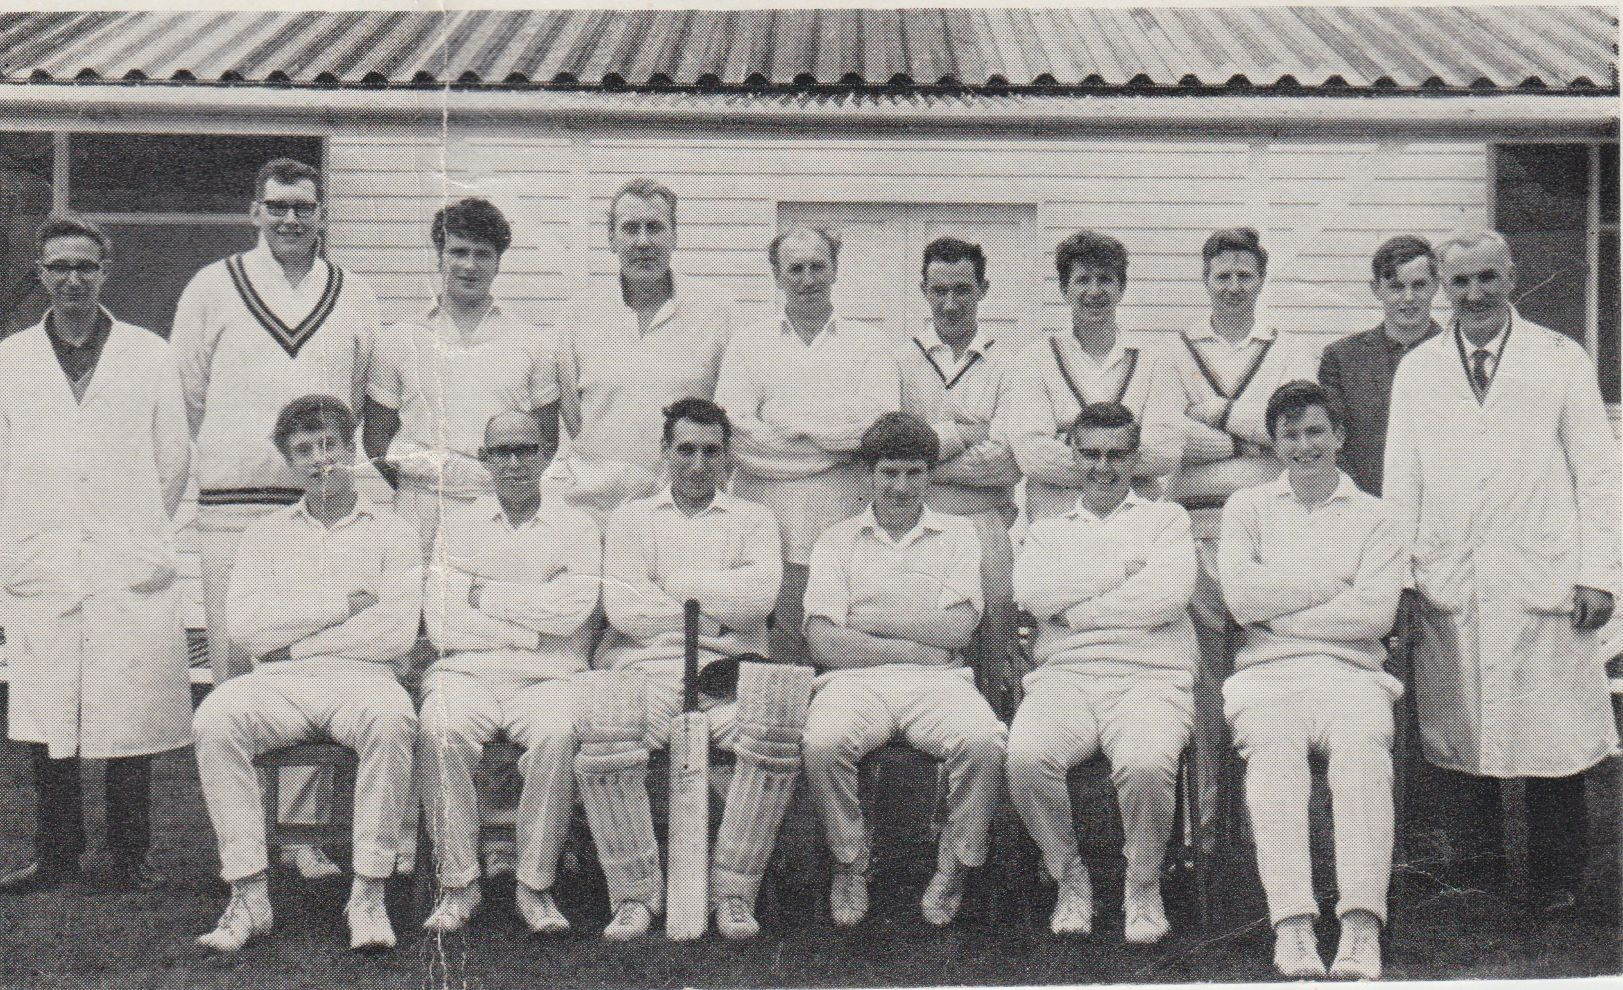 cricket_pavilion_1967_team_0001.jpg